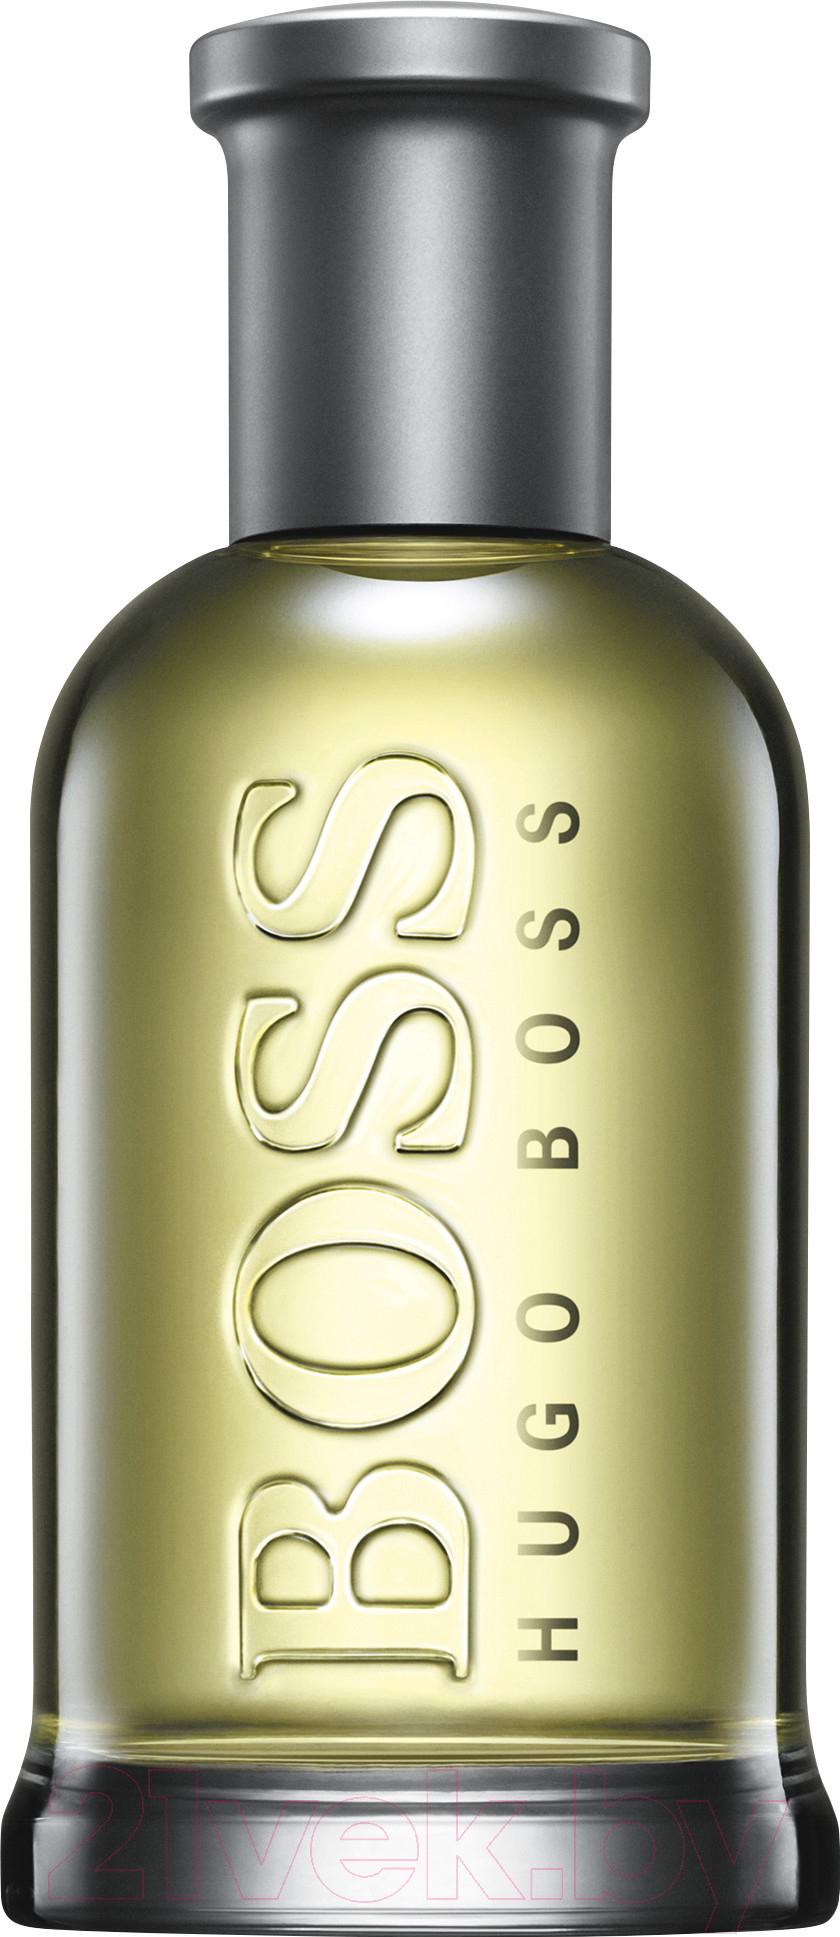 Купить Туалетная вода Hugo Boss, Boss Bottled (50мл), Швейцария, Boss Bottled (Hugo Boss)